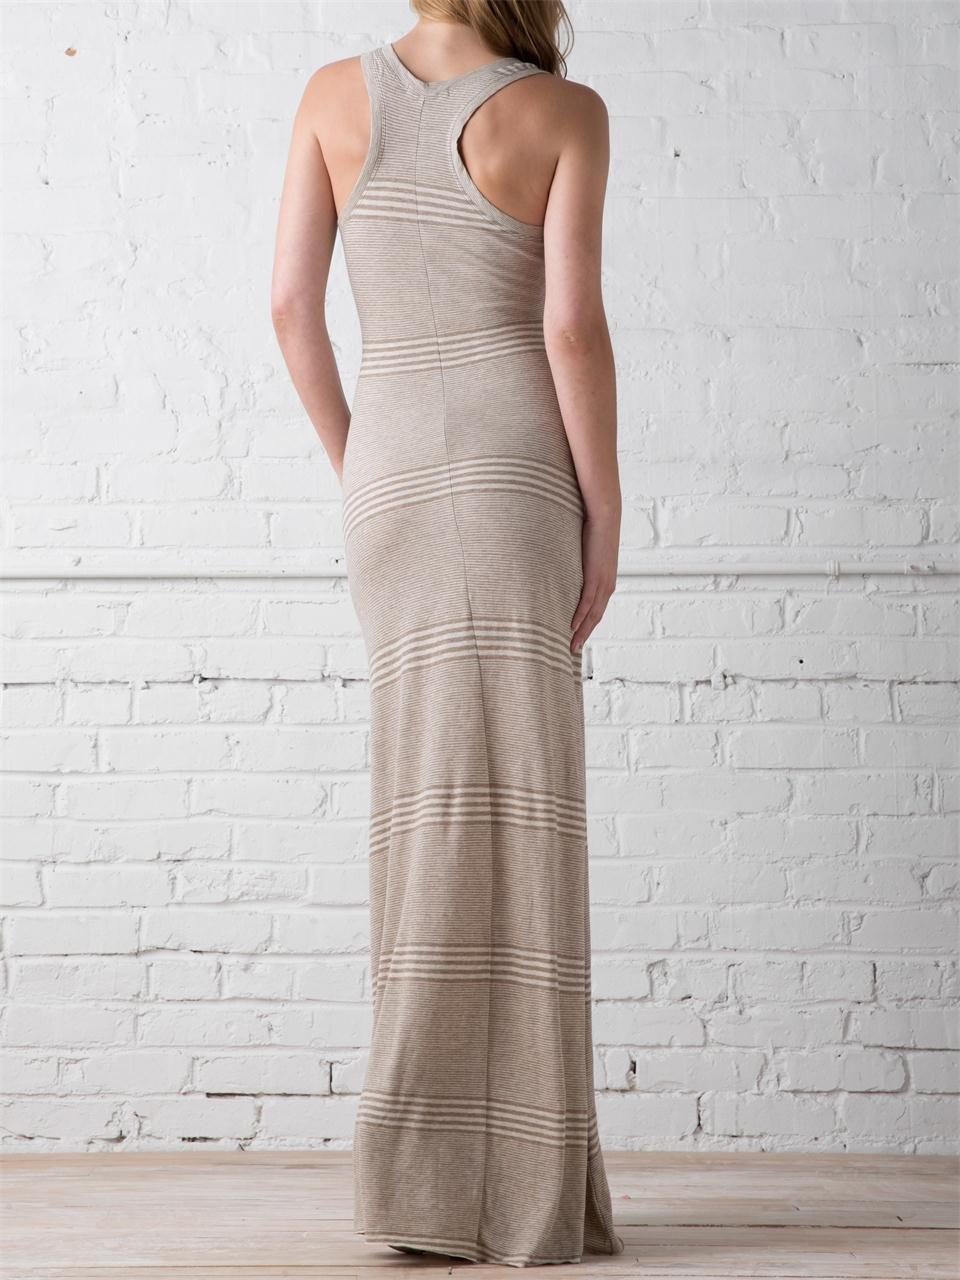 Lyst Alternative Apparel Jacquard Racerback Maxi Dress In Gray